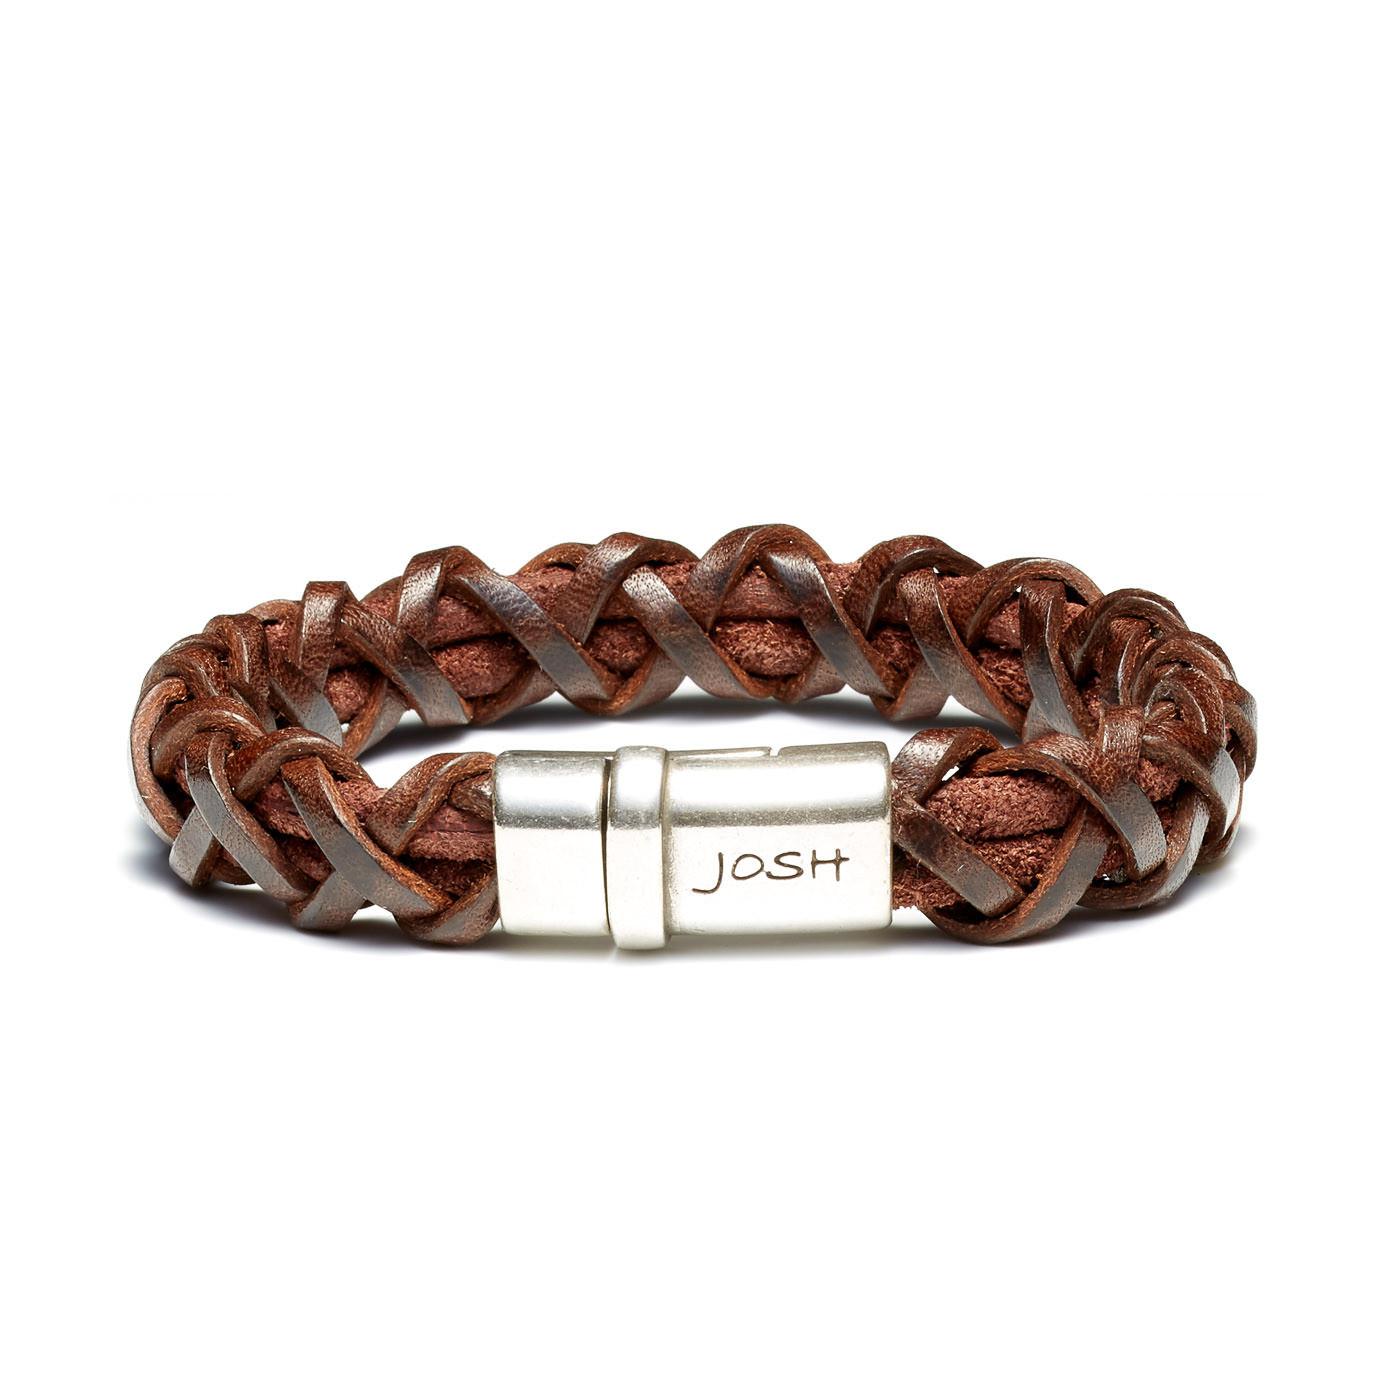 Josh Vintage Brown Armband 09194-BRA-S/BROWN (Lengte: 20.50-22.50 cm)